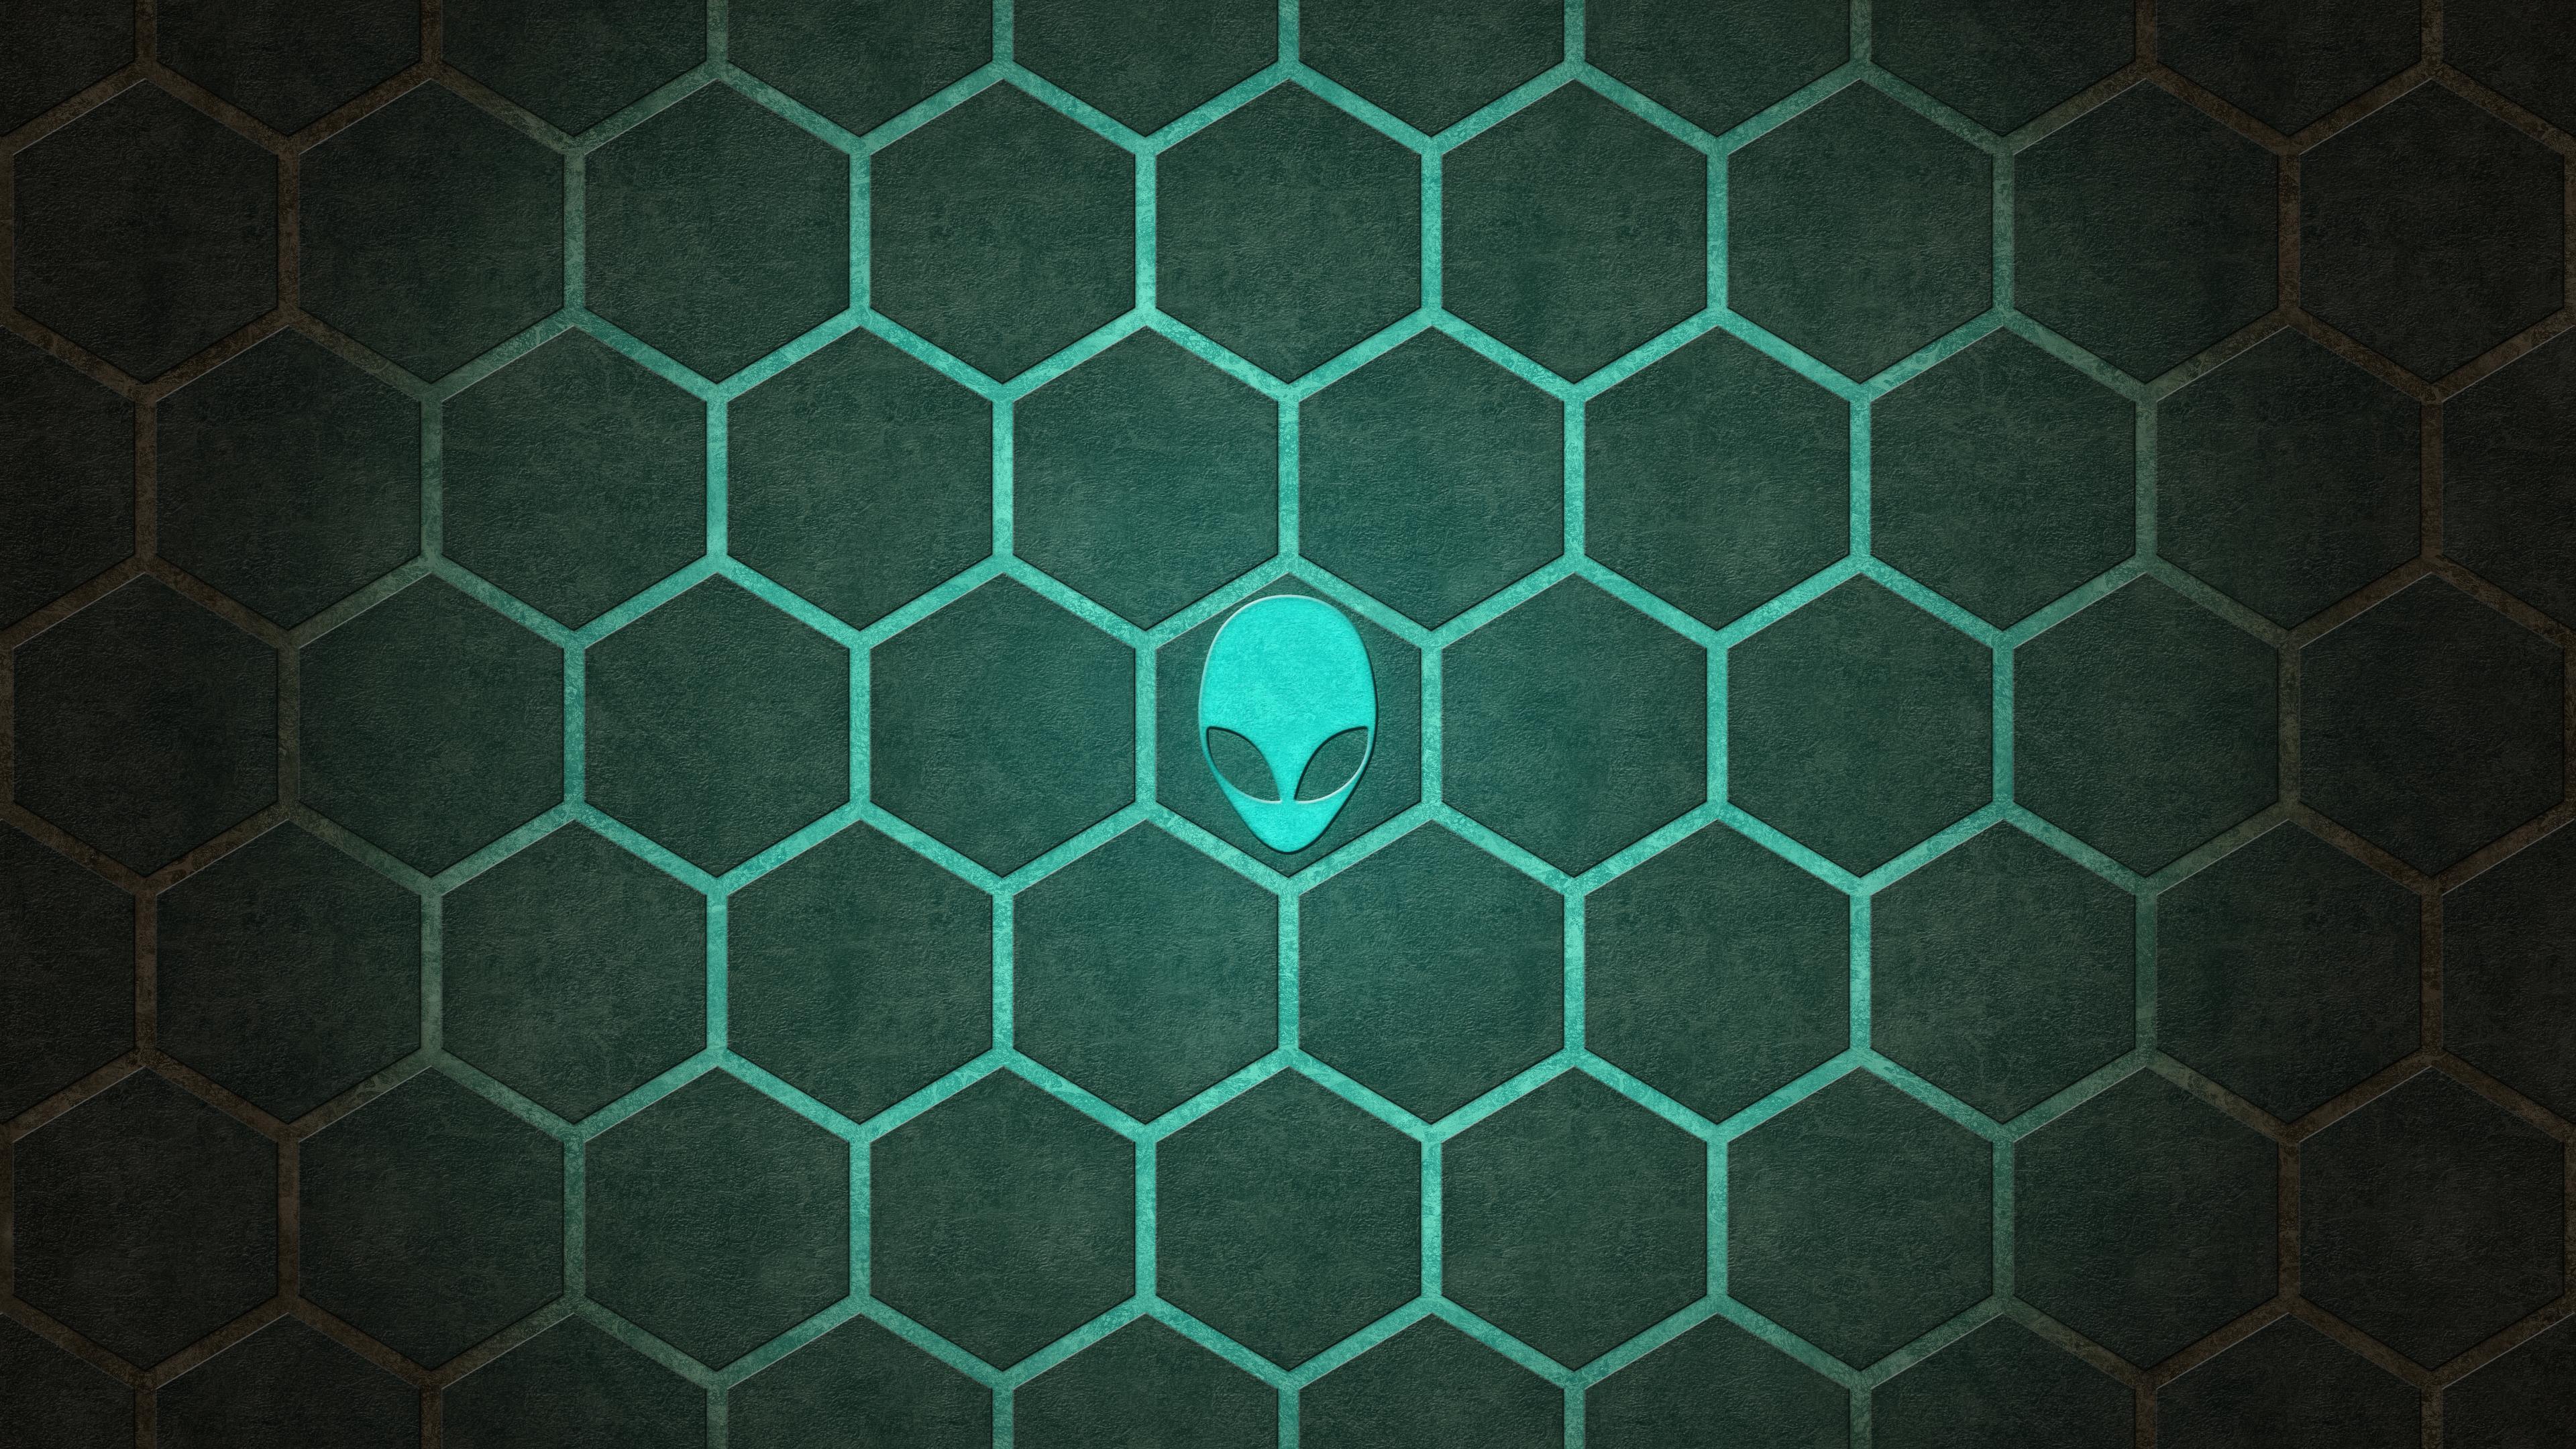 Alienware Hexagon UltraHD 4K wallpaper by Locix ITA 3840x2160